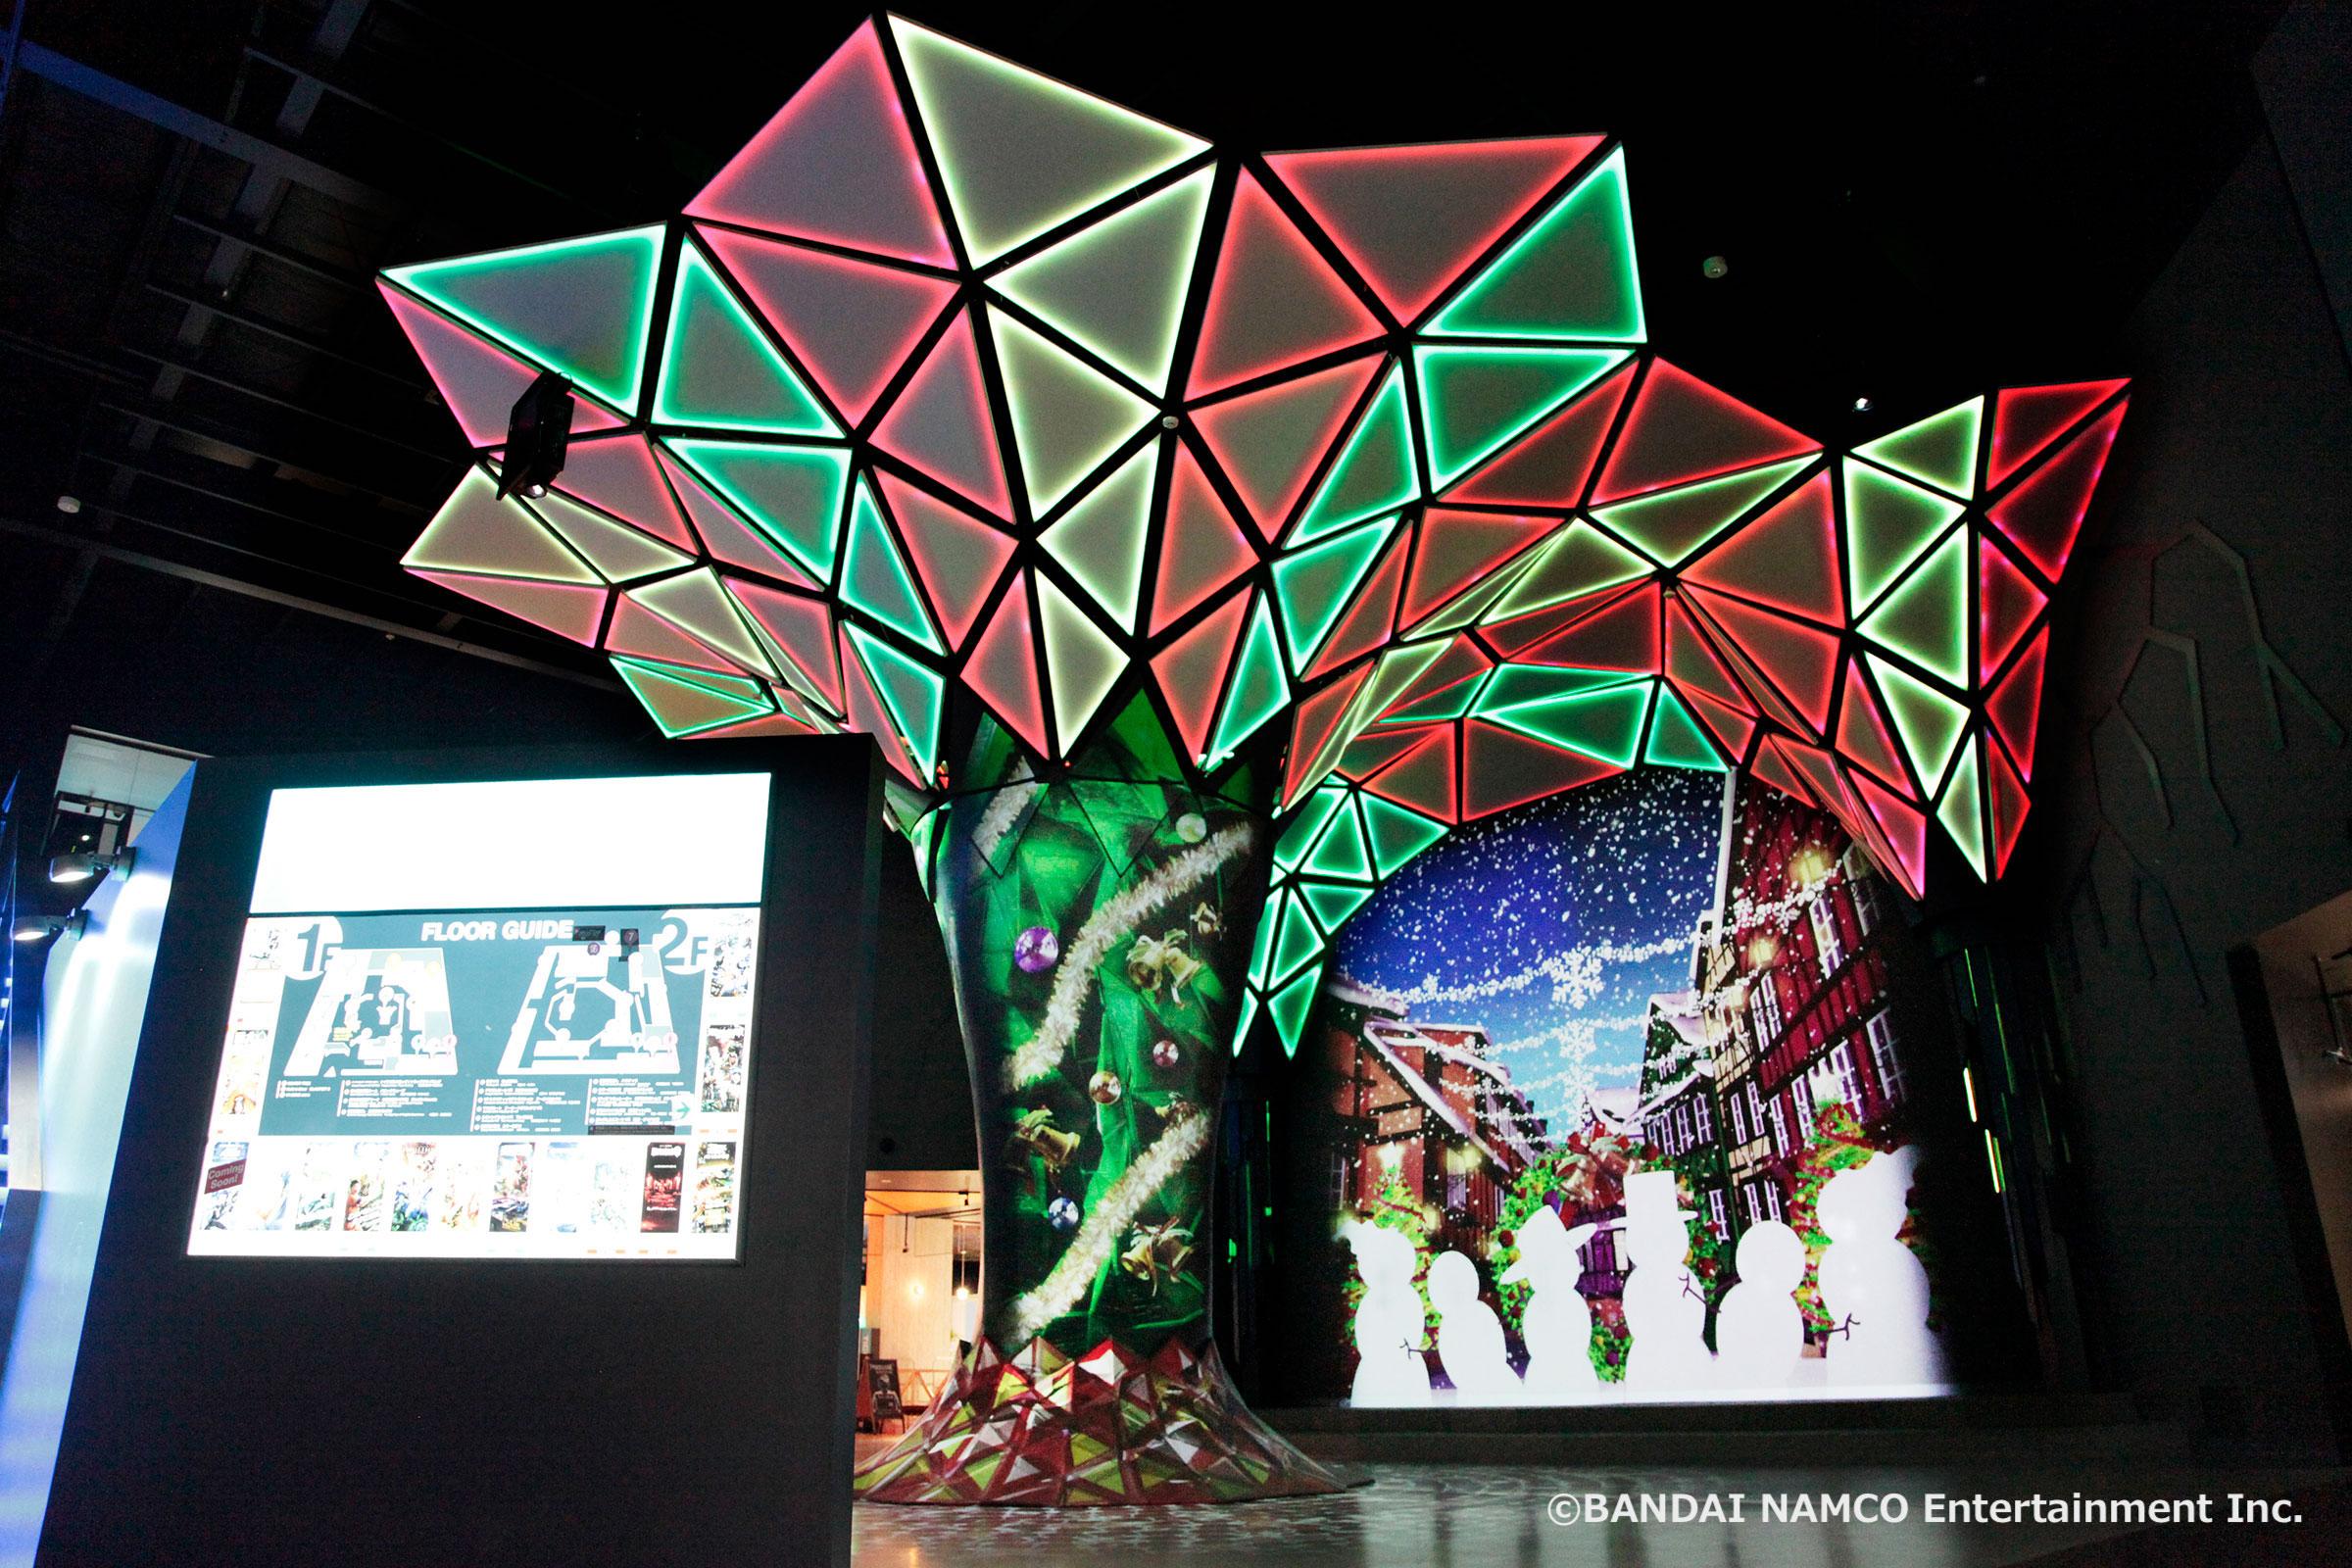 VR ZONE SHINJUKUのクリスマス演出